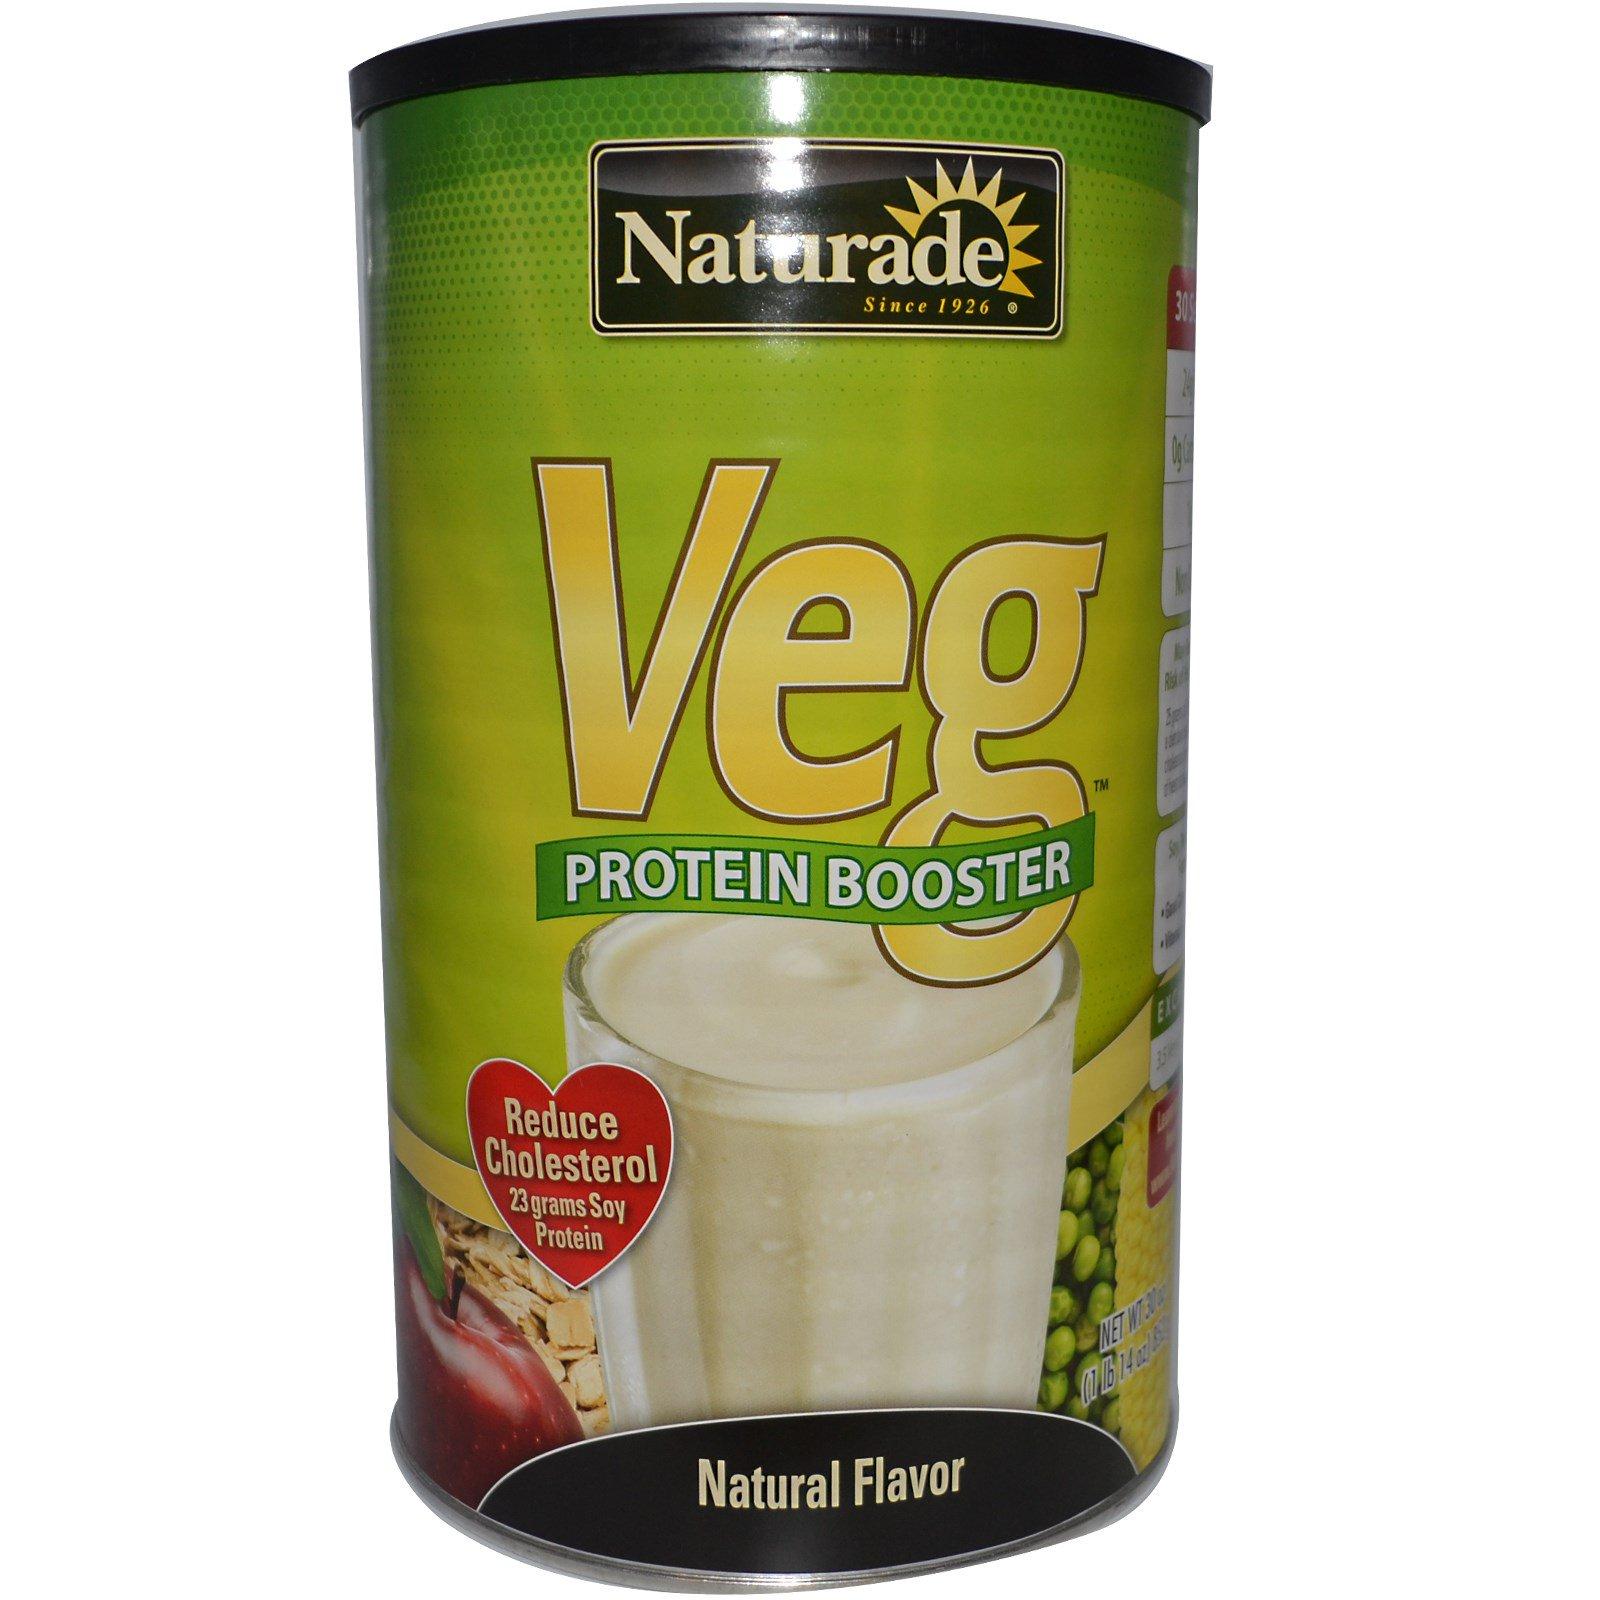 Naturade Veg Protein Booster Natural Flavor 30 Oz 852 G